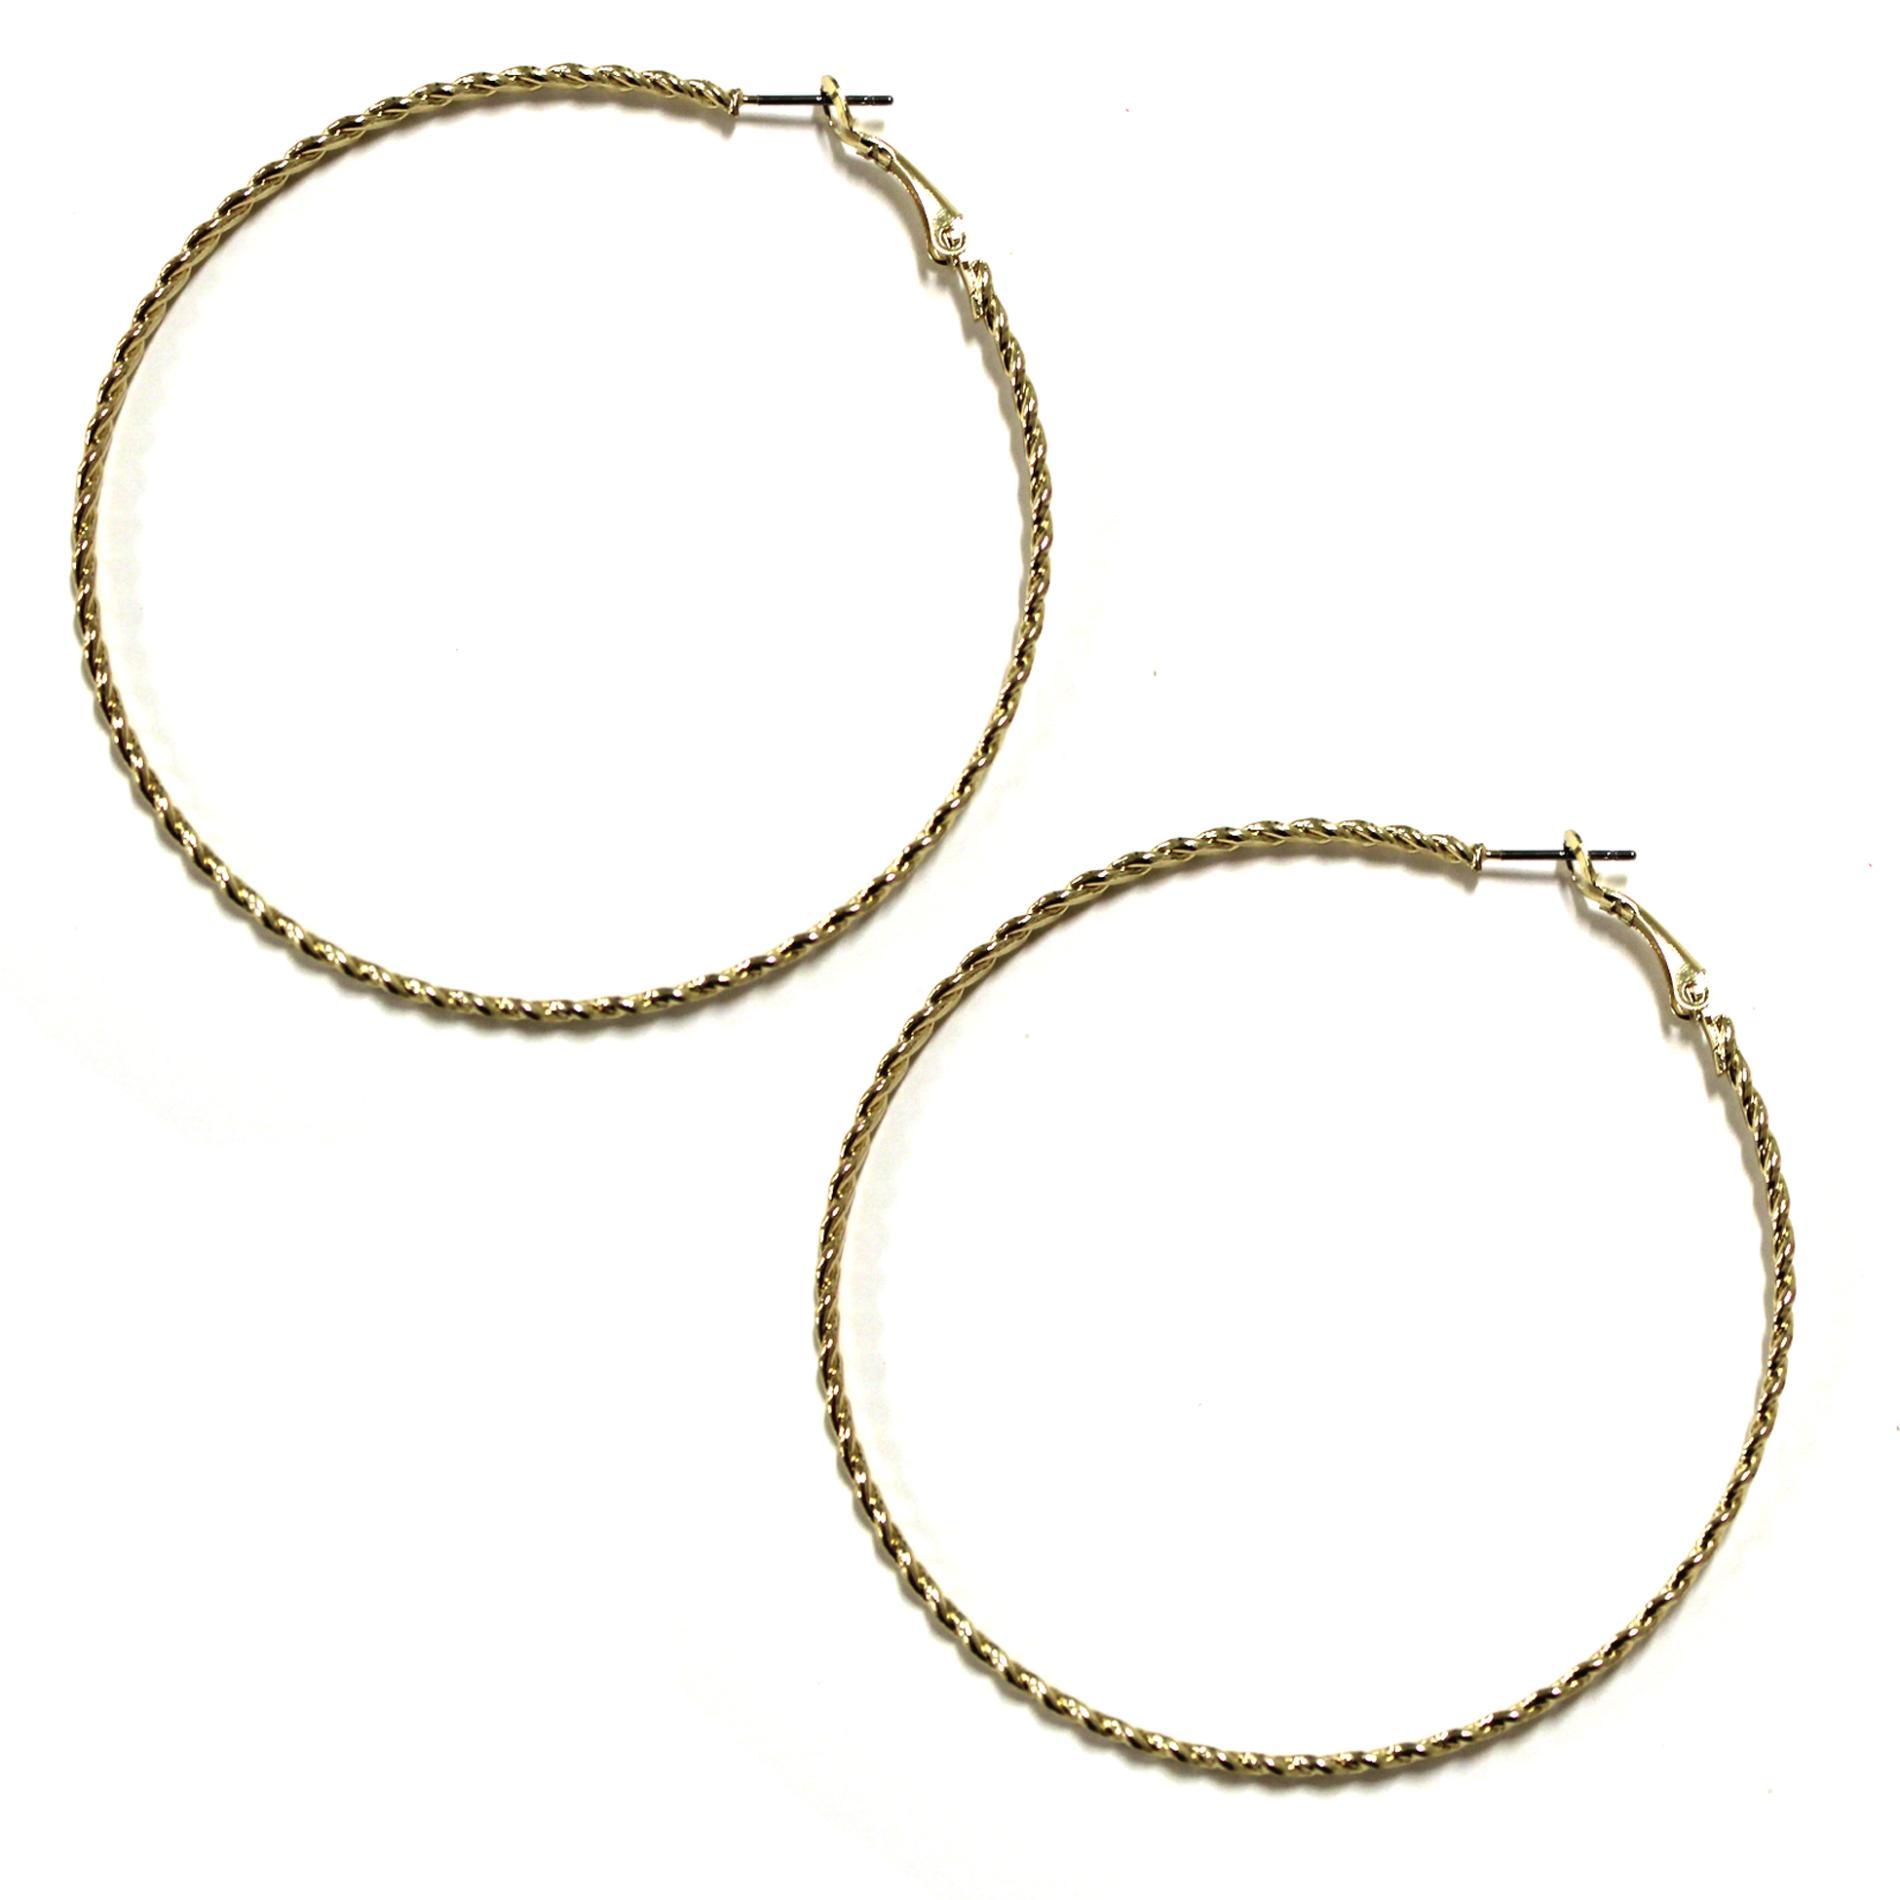 Women's Twisted Hoop Earrings - Goldtone